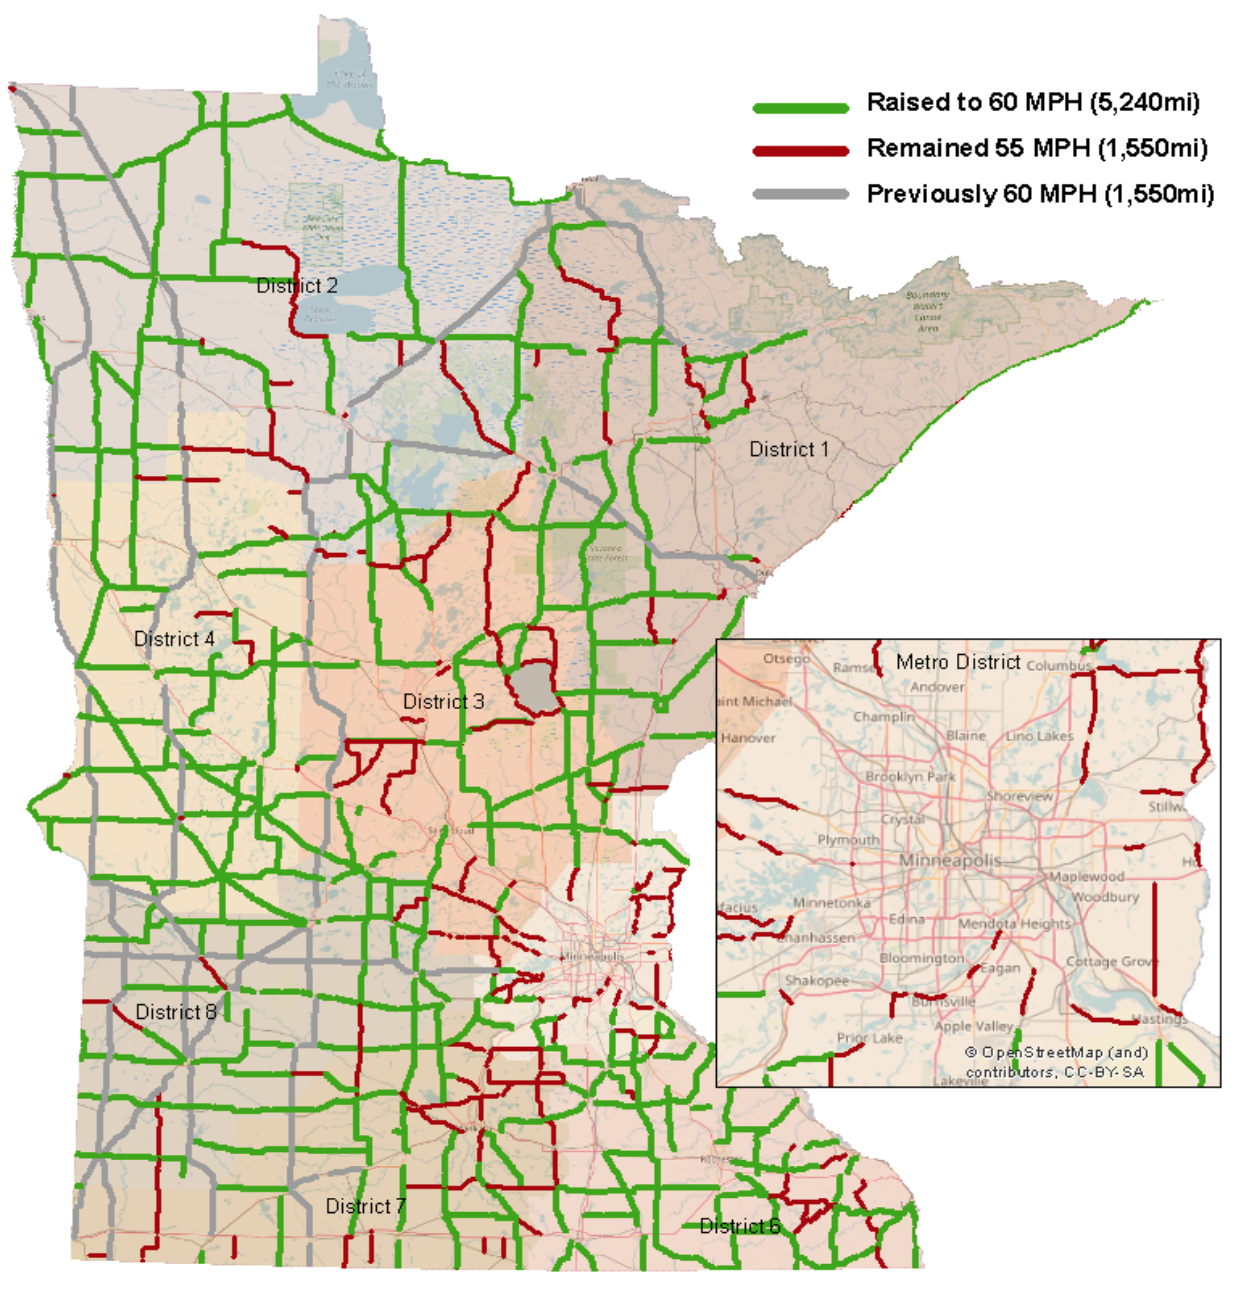 Minnesota raises speed limits to 60 on over 5,000 miles of highways